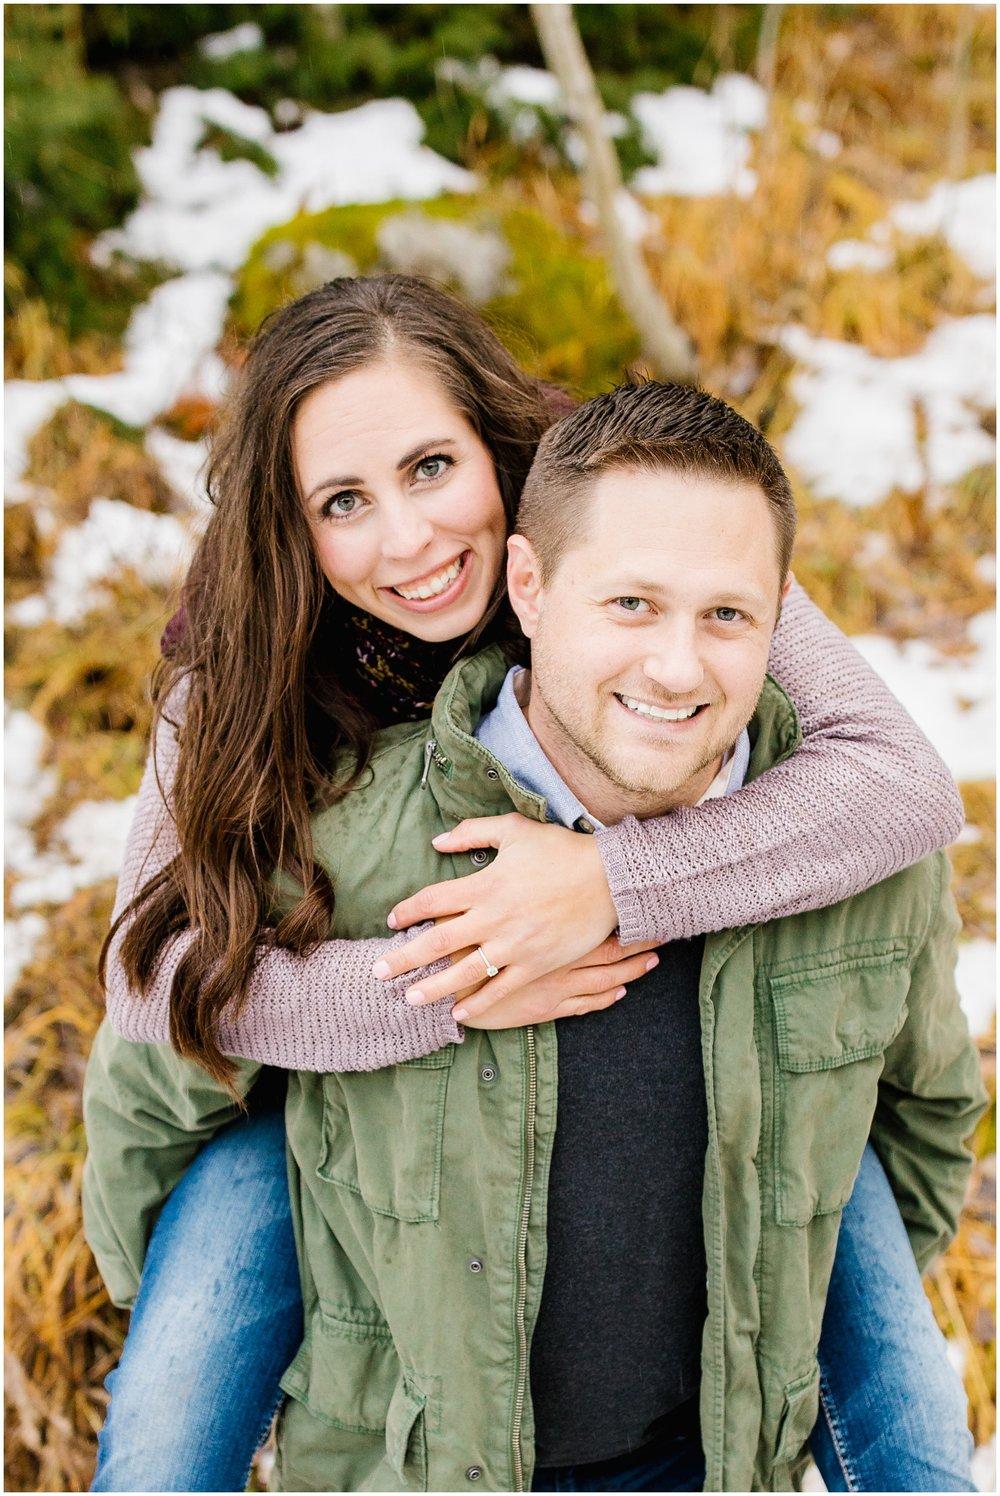 SSEngagements-64_Lizzie-B-Imagery-Utah-Wedding-Photographer-Park-City-Salt-Lake-City-Logan-Utah-Engagement-Session.jpg